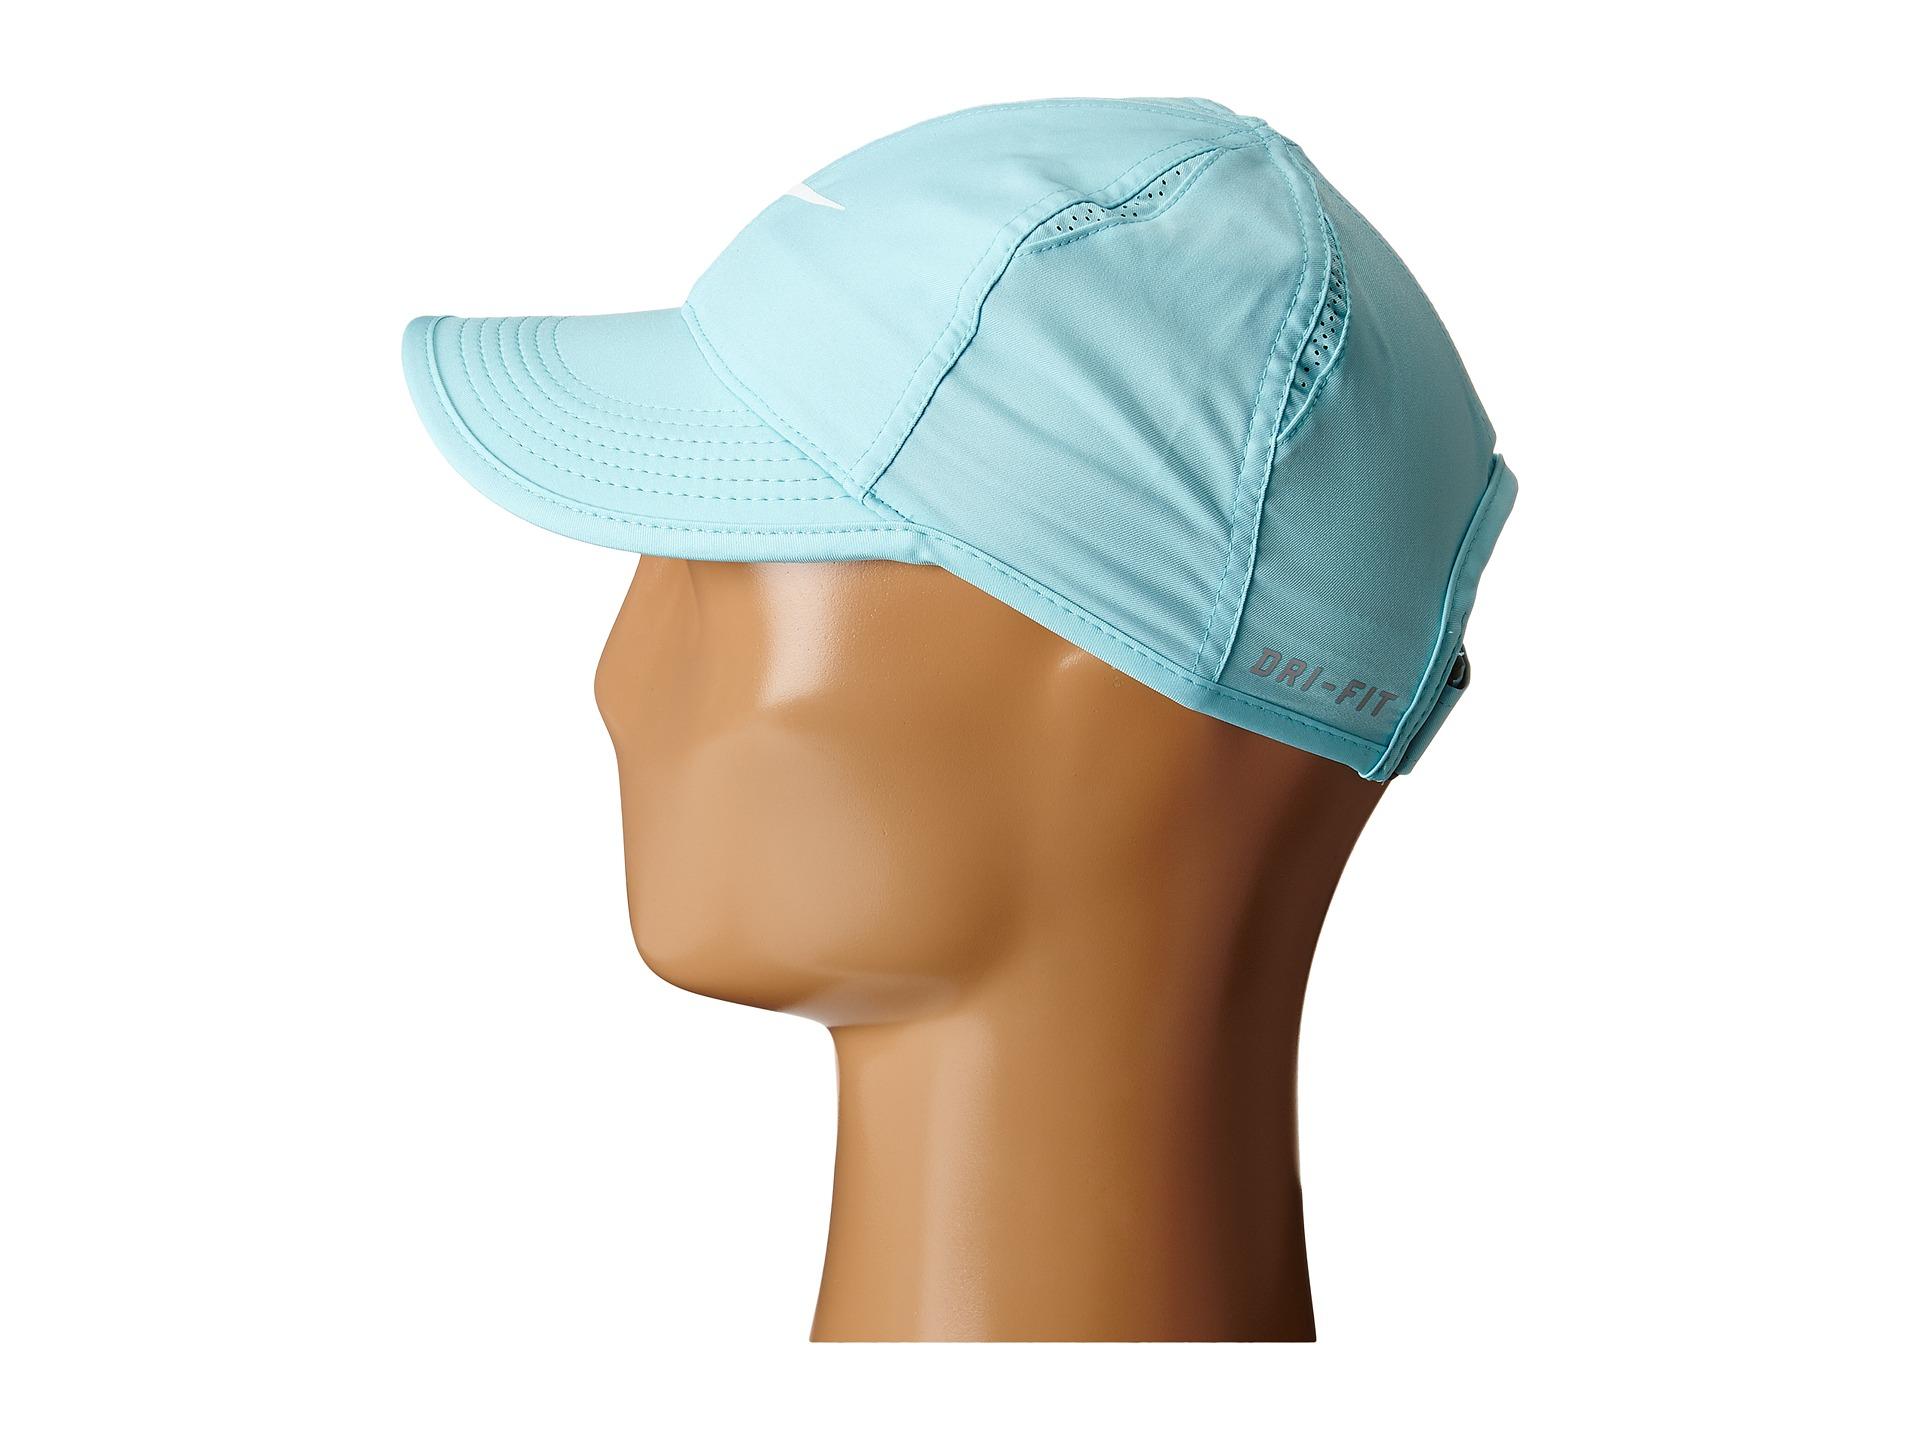 94c3b435cb28a Lyst - Nike Featherlight Cap in Blue for Men